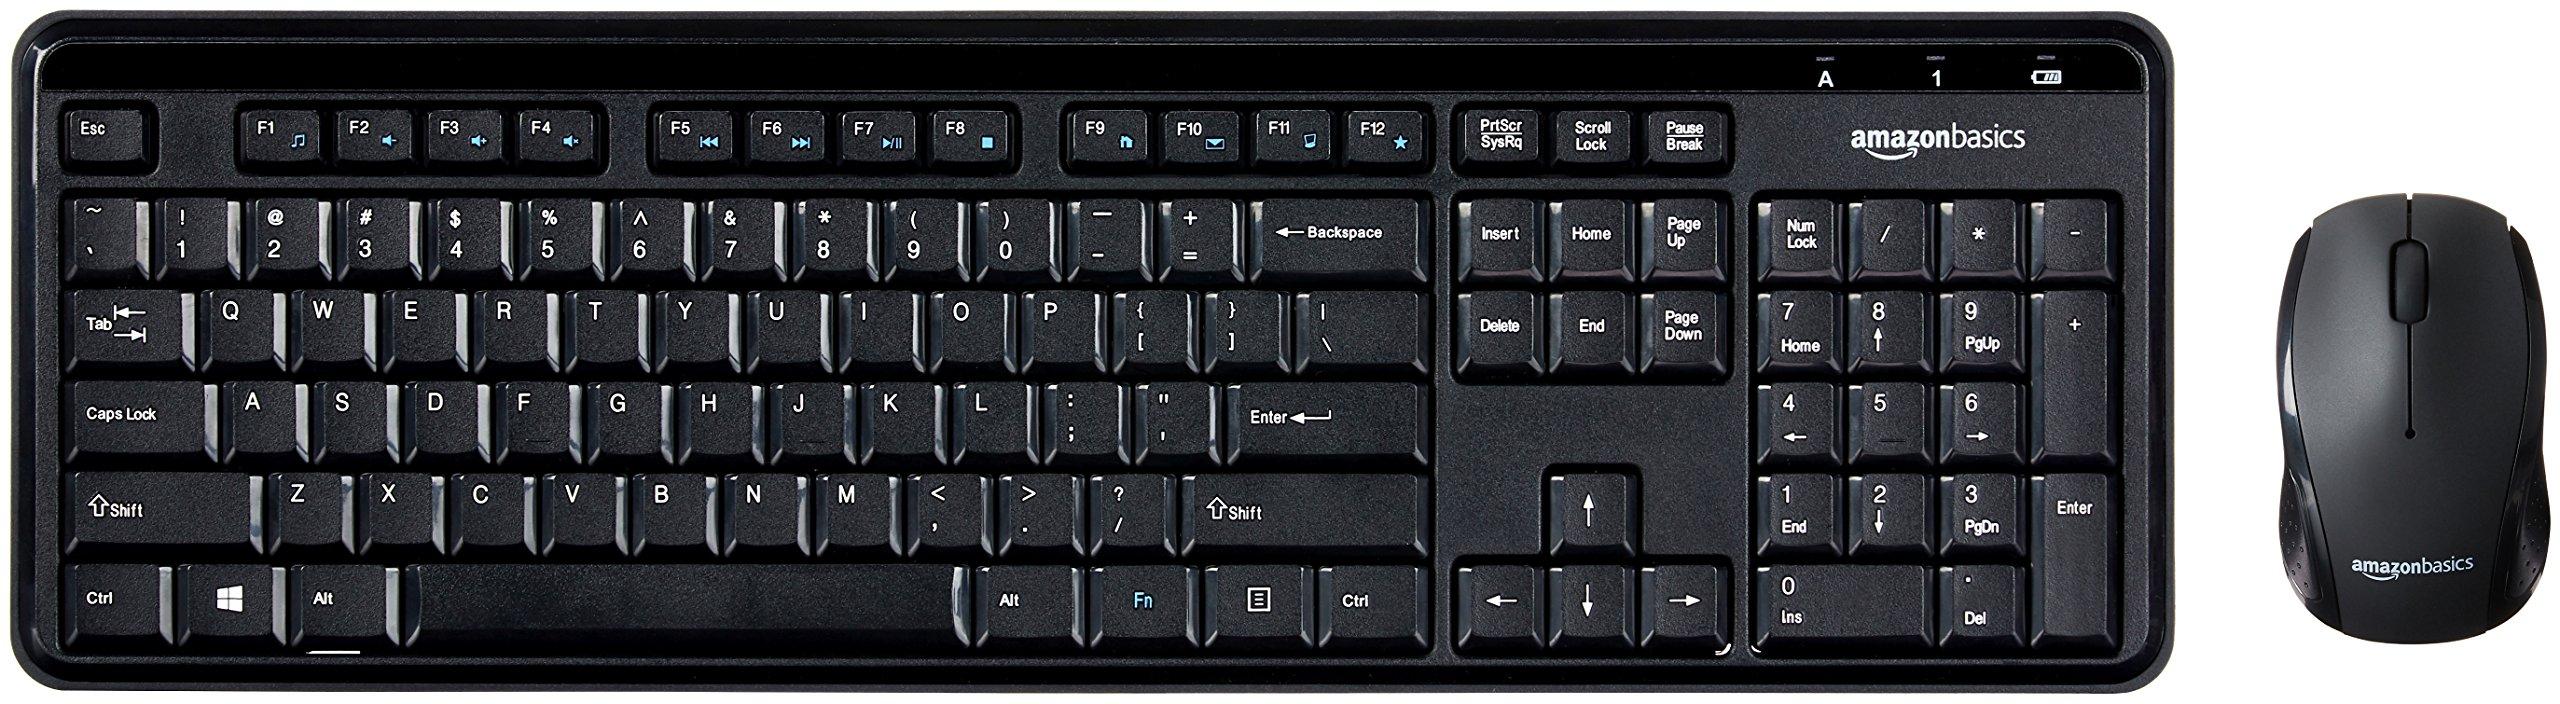 AmazonBasics Wireless Keyboard Mouse Combo - Quiet Compact - US Layout (QWERTY)